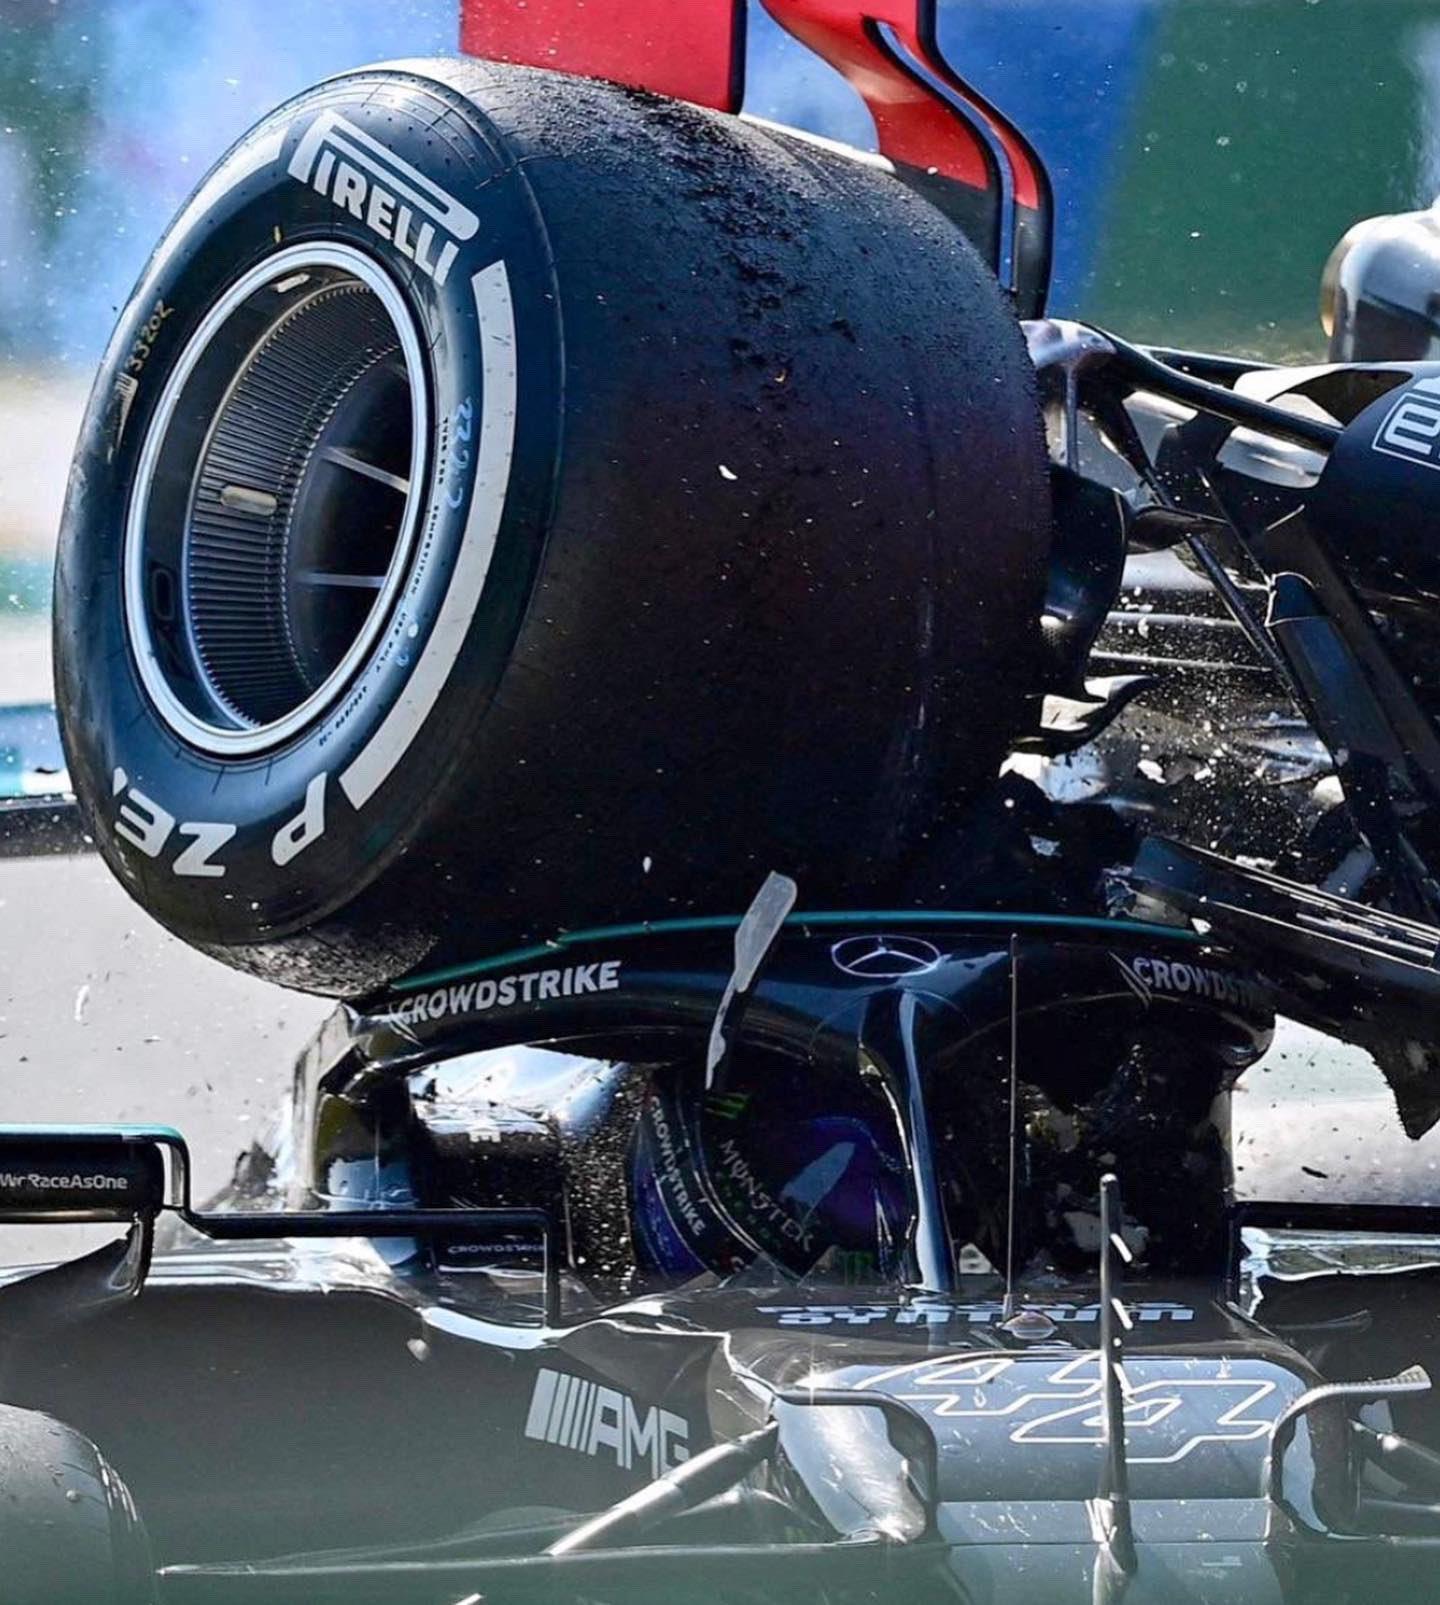 GP d'Italie 2021 : Formula 1 Heineken Gran Primo D'Italia 2021 - Page 16 E_HCPlWWQAA-AIn?format=jpg&name=large